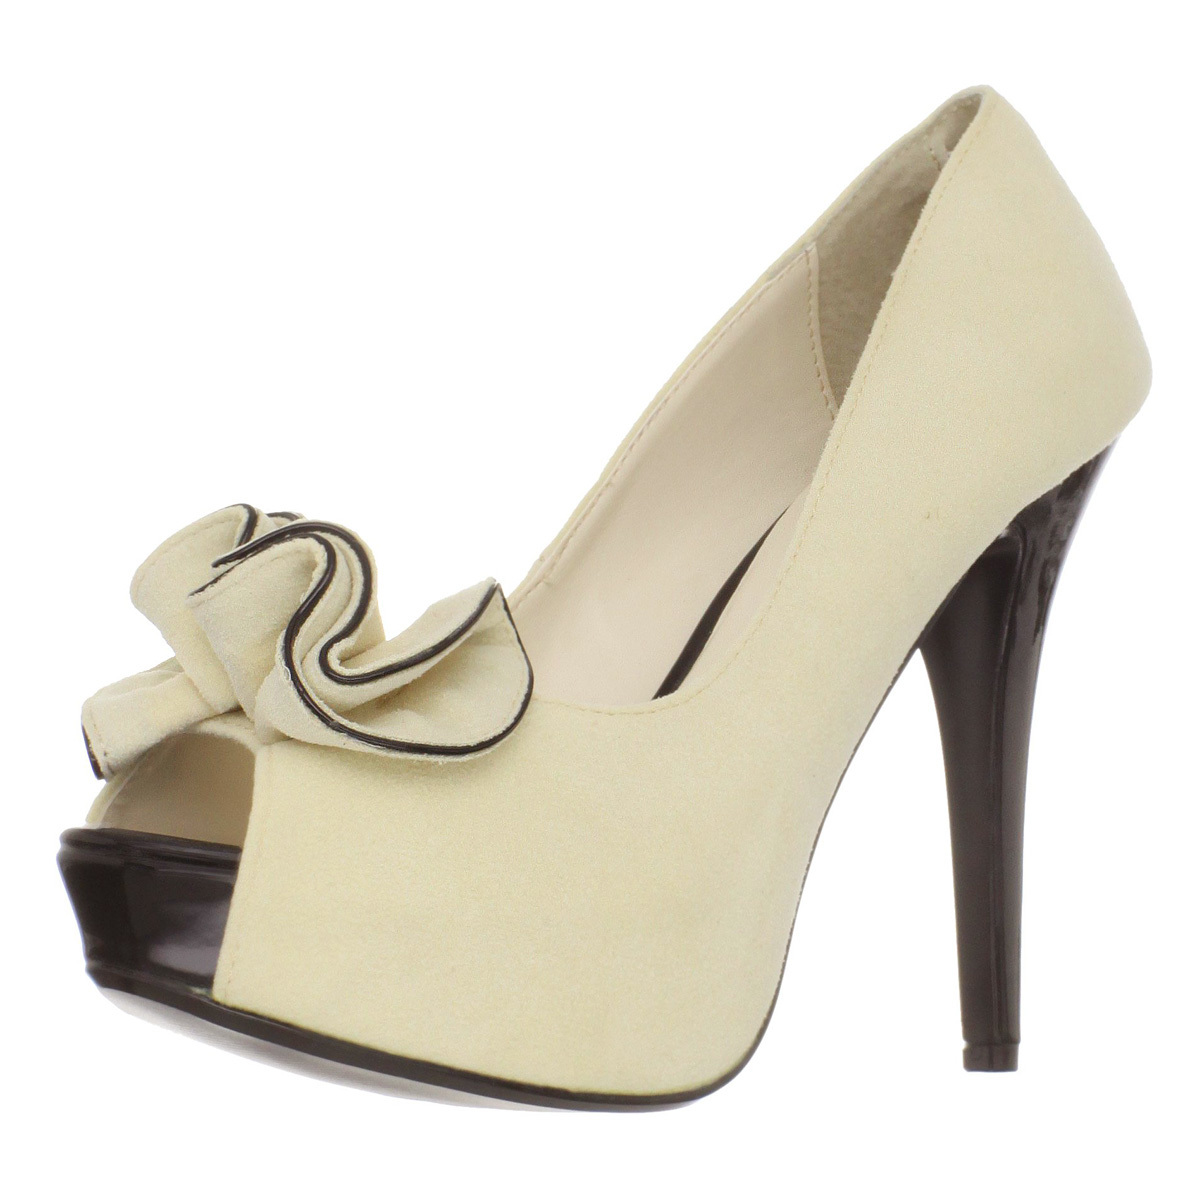 Womens Cream Pumps Ruffle Peep Toe Shoes 5 Inch Heels Cla...